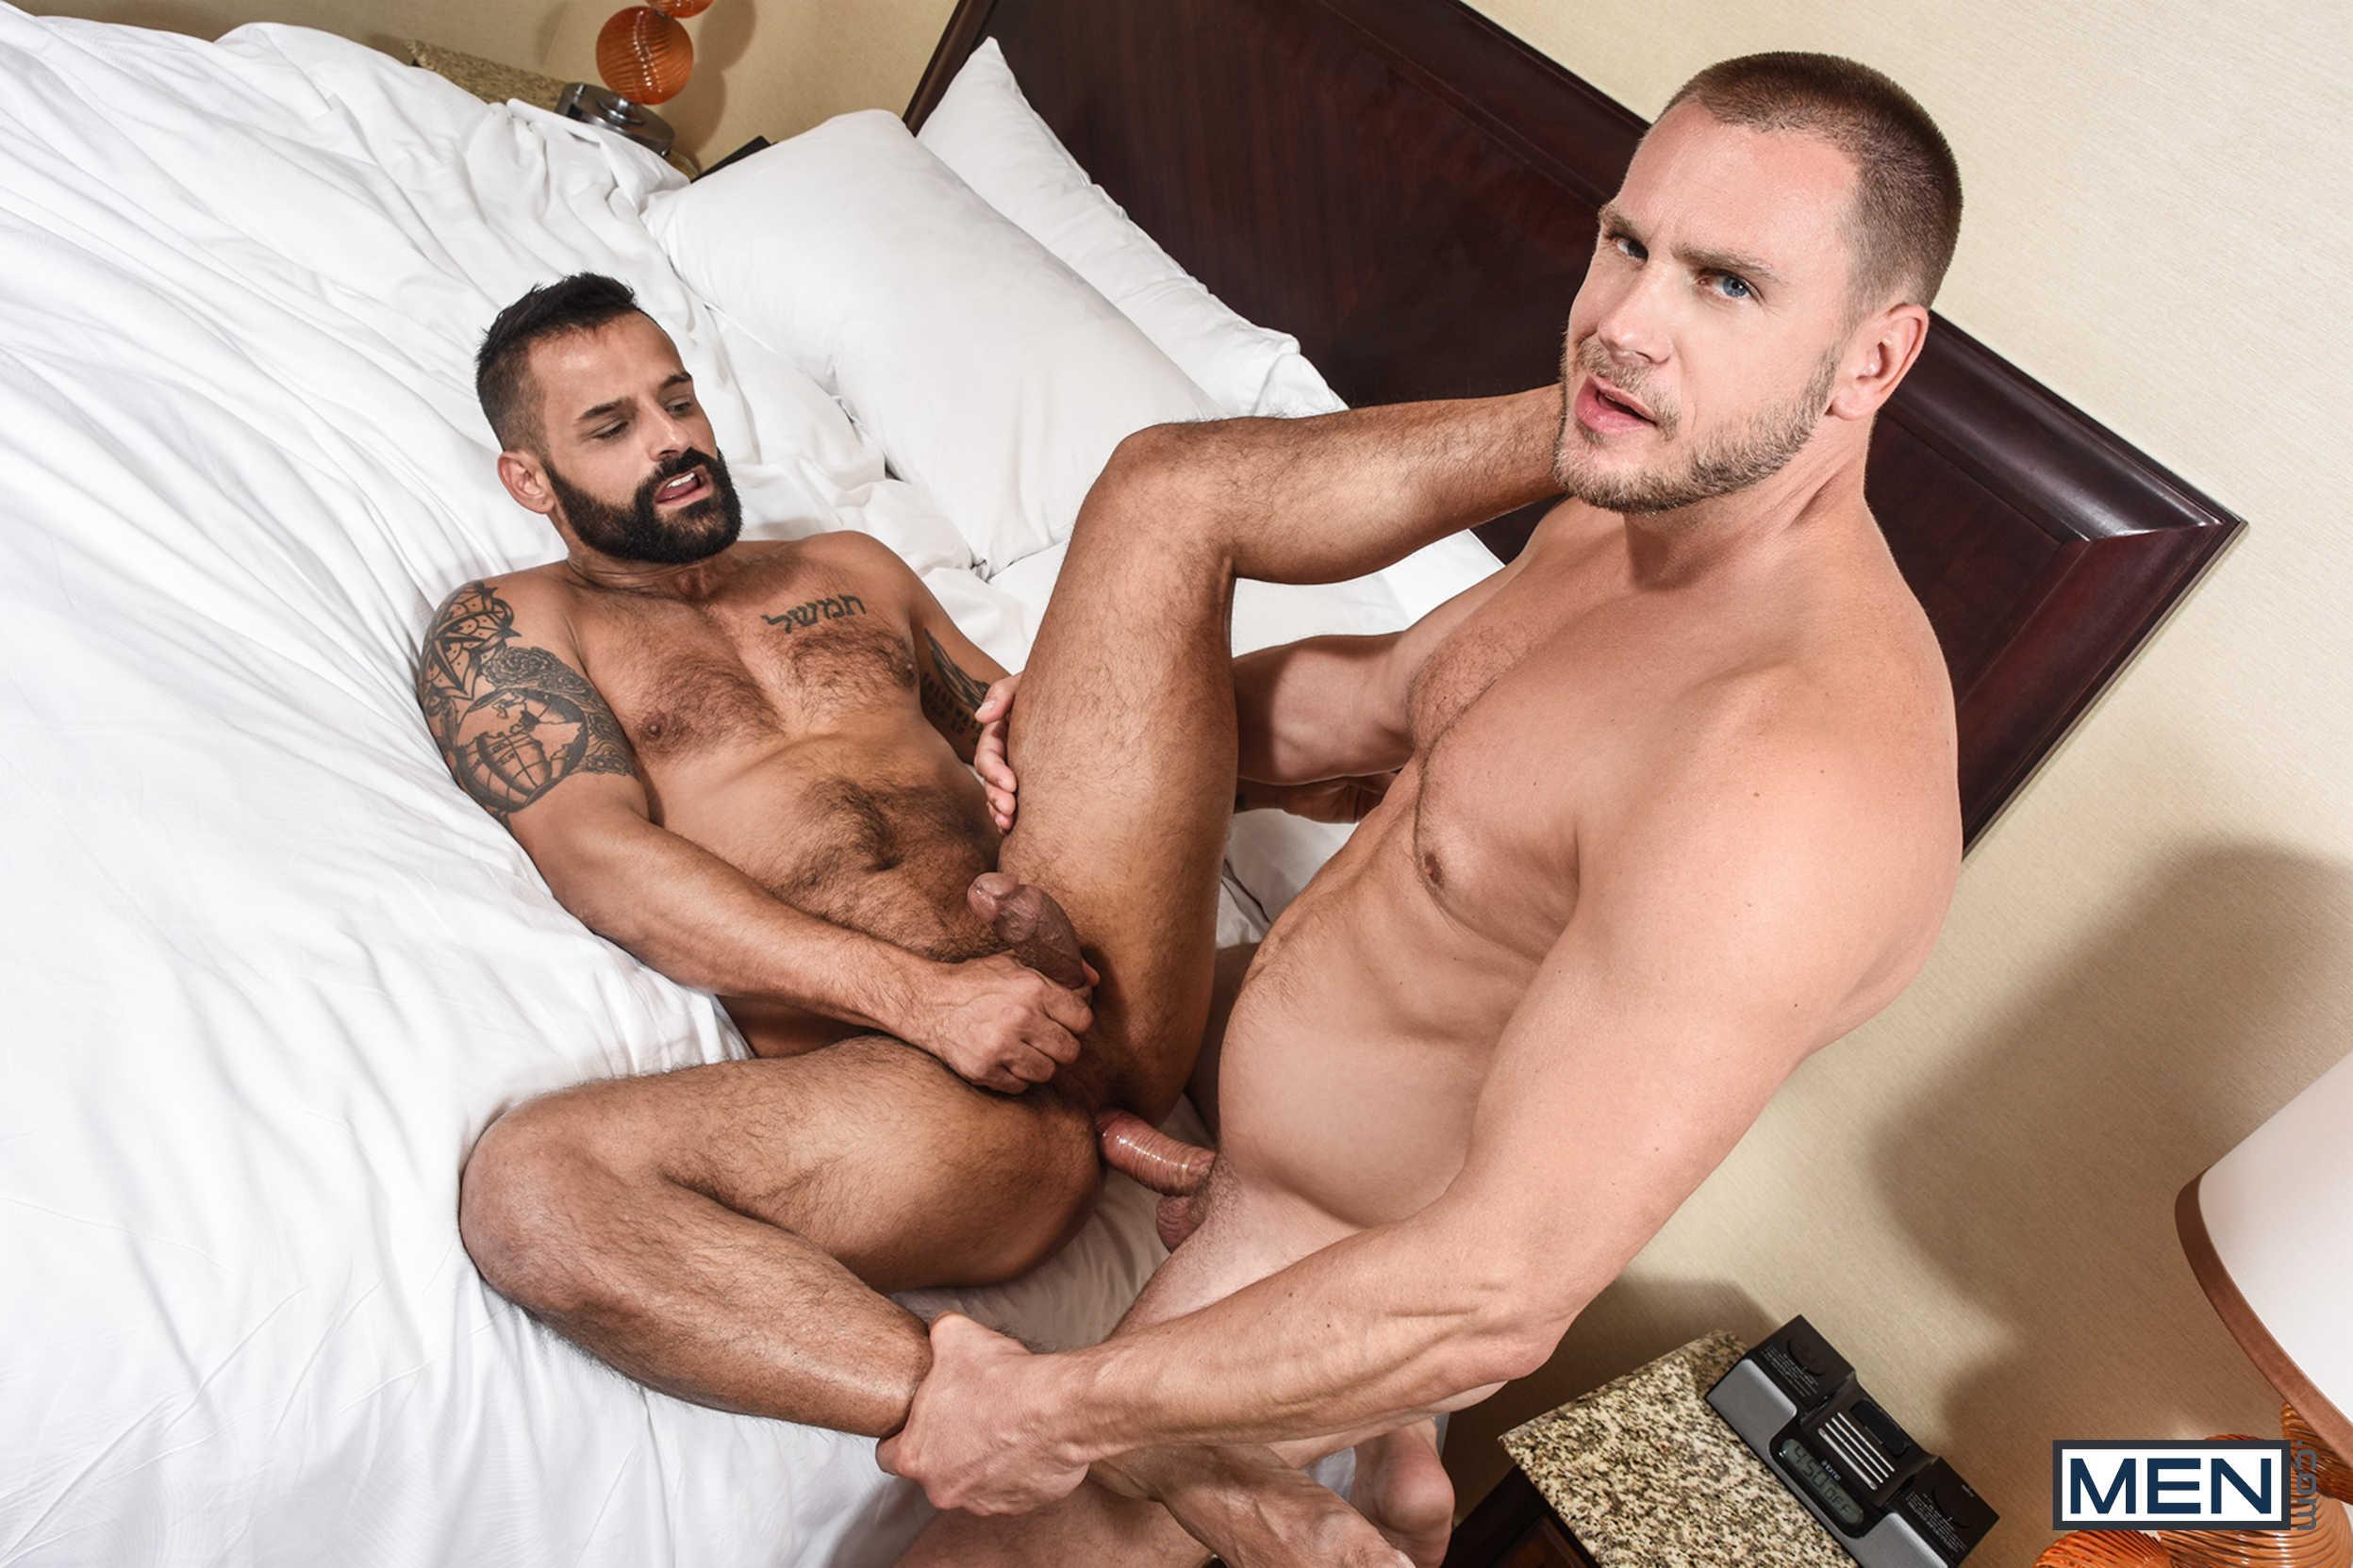 guy helps a buddy shower gay sex videos